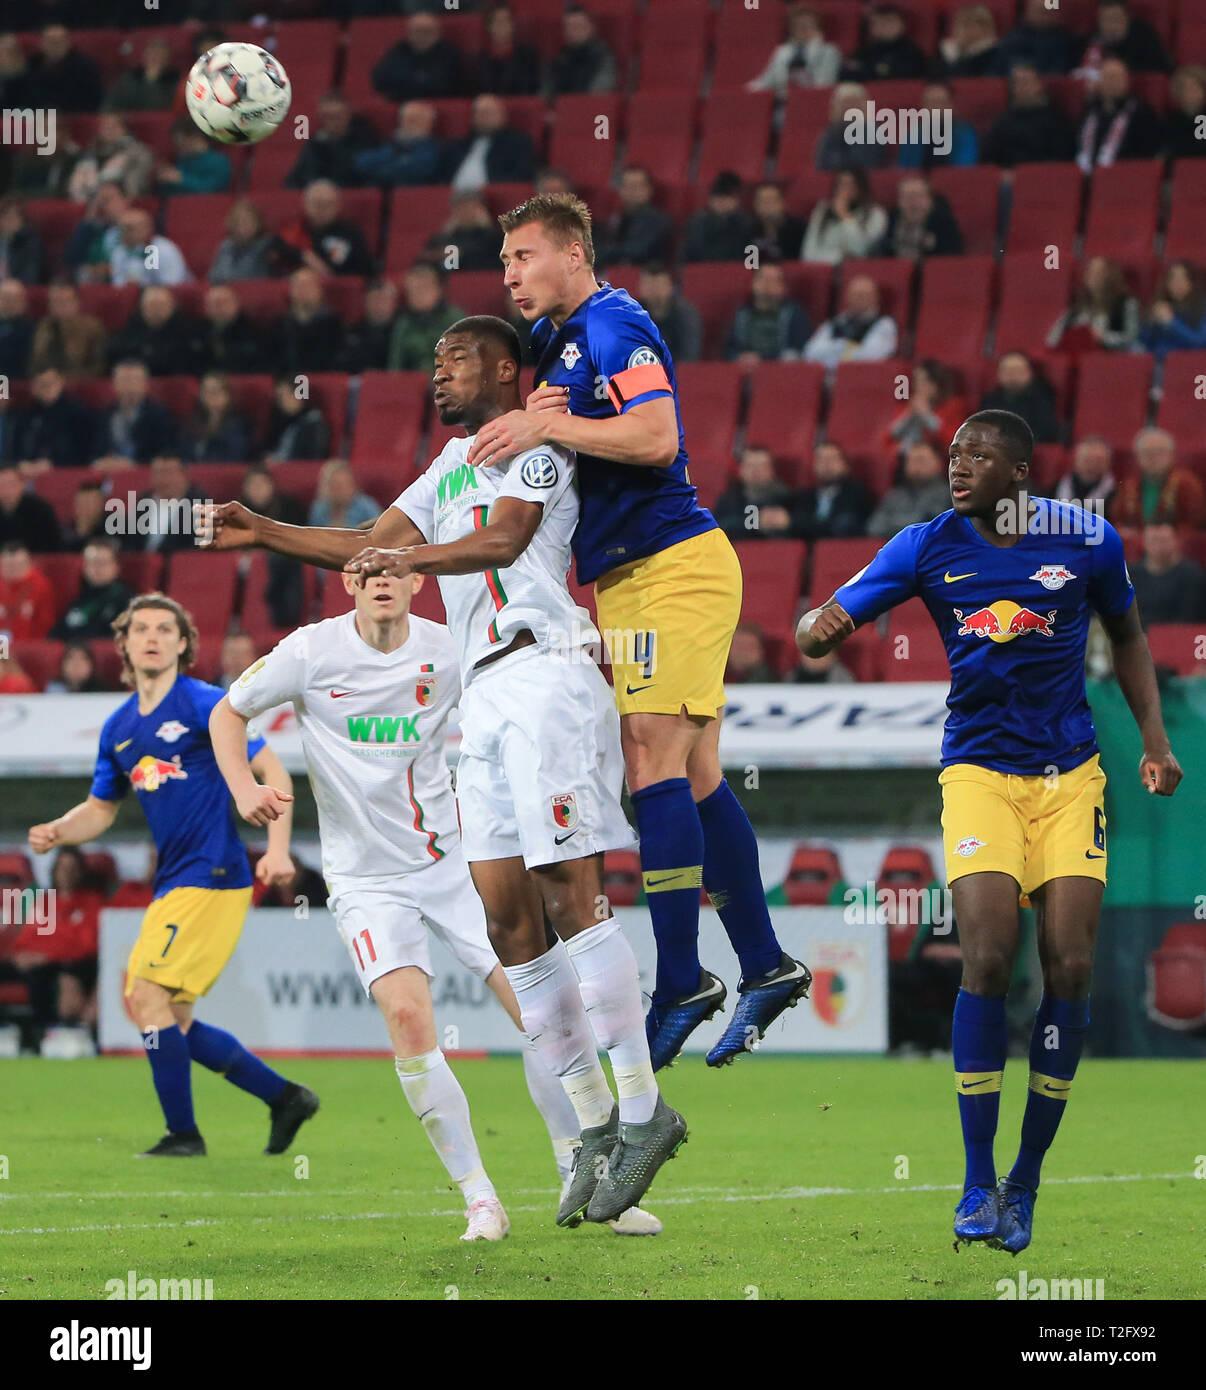 neuf dans sa boîte!!! Football Derbystar Championnat 2018//2019 Taille 5 Ball neuf